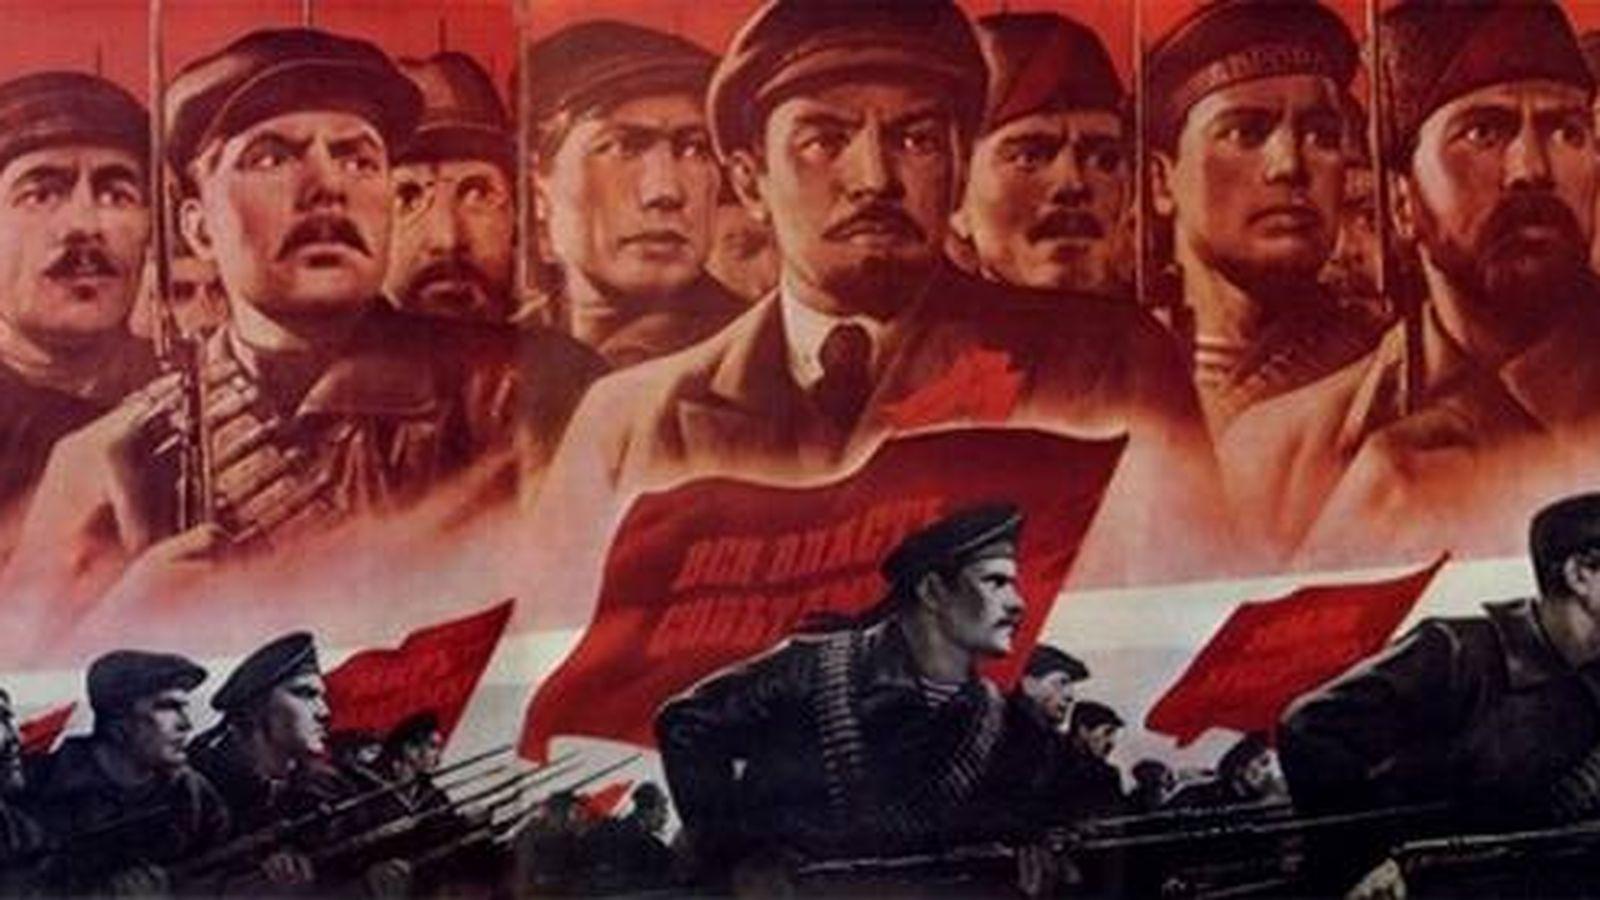 Ilustración de bolcheviques y mencheviques